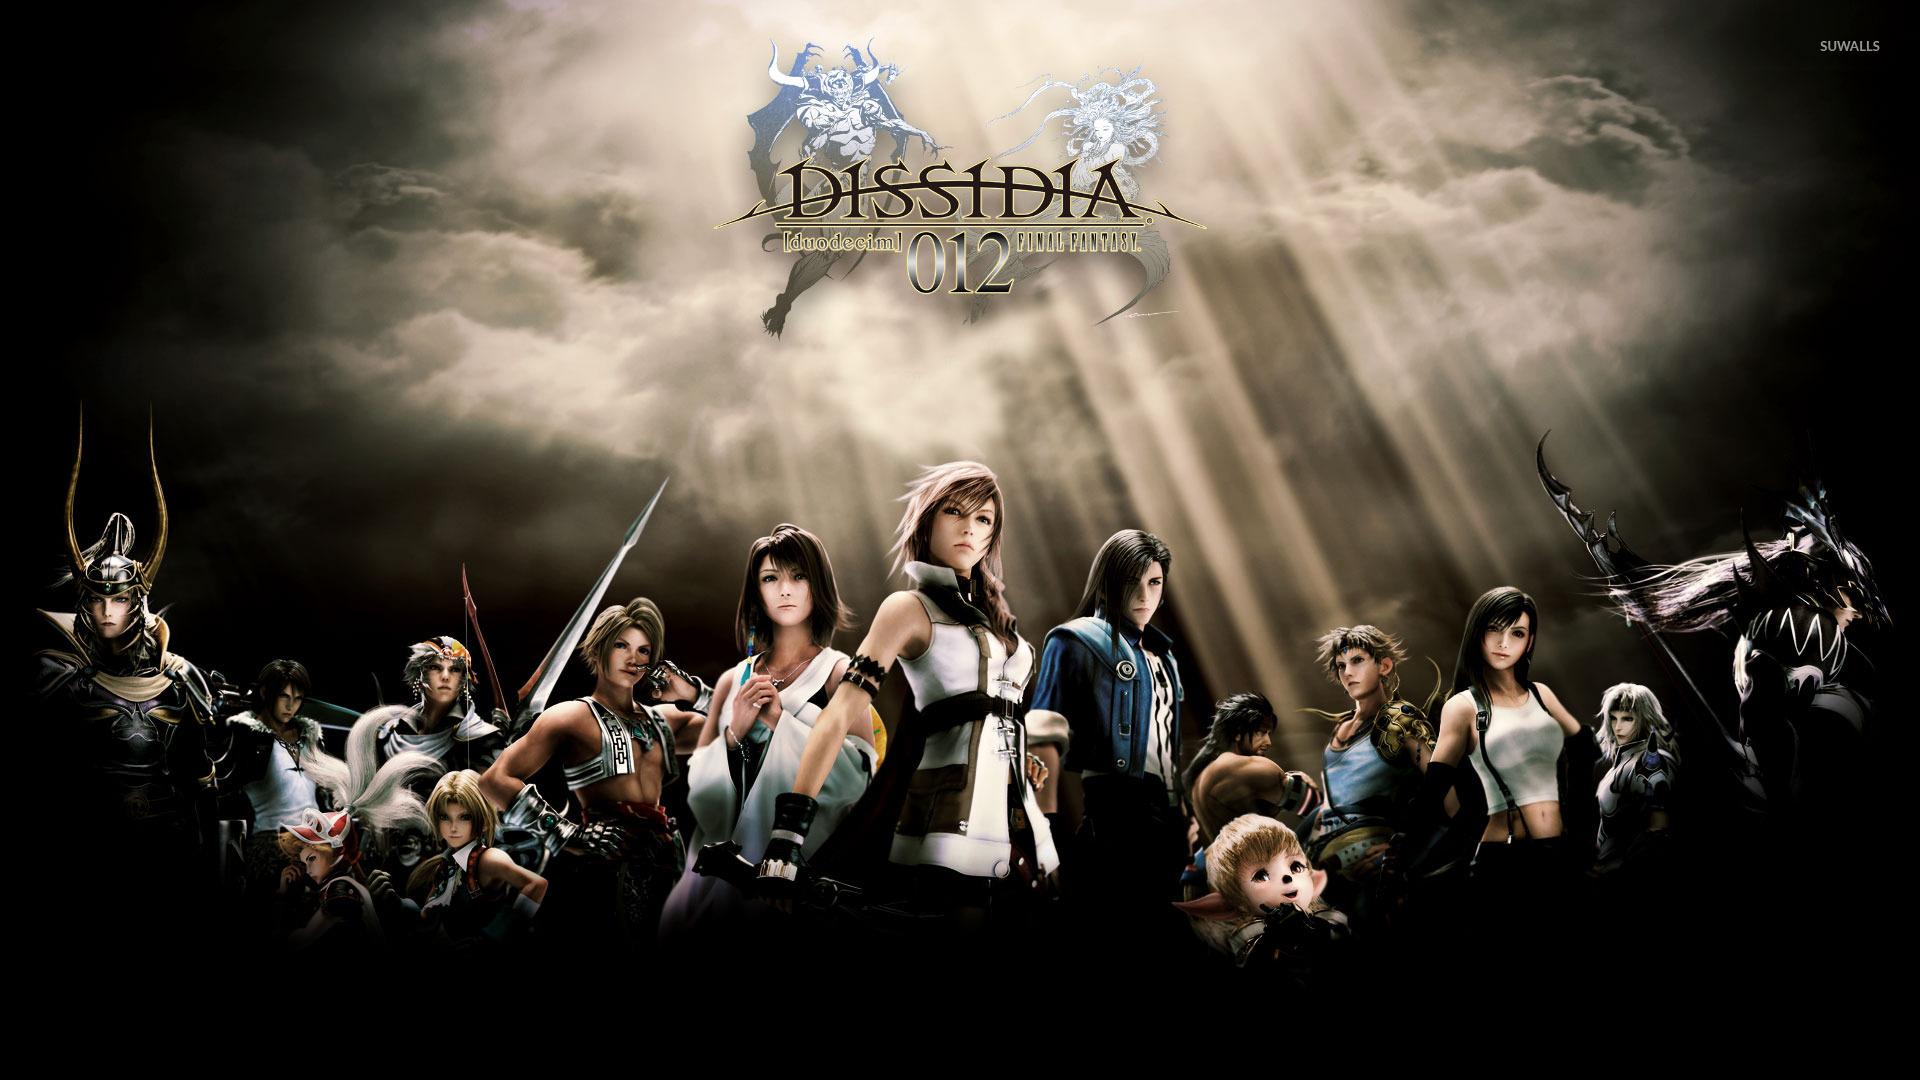 Dissidia Final Fantasy [2] wallpaper